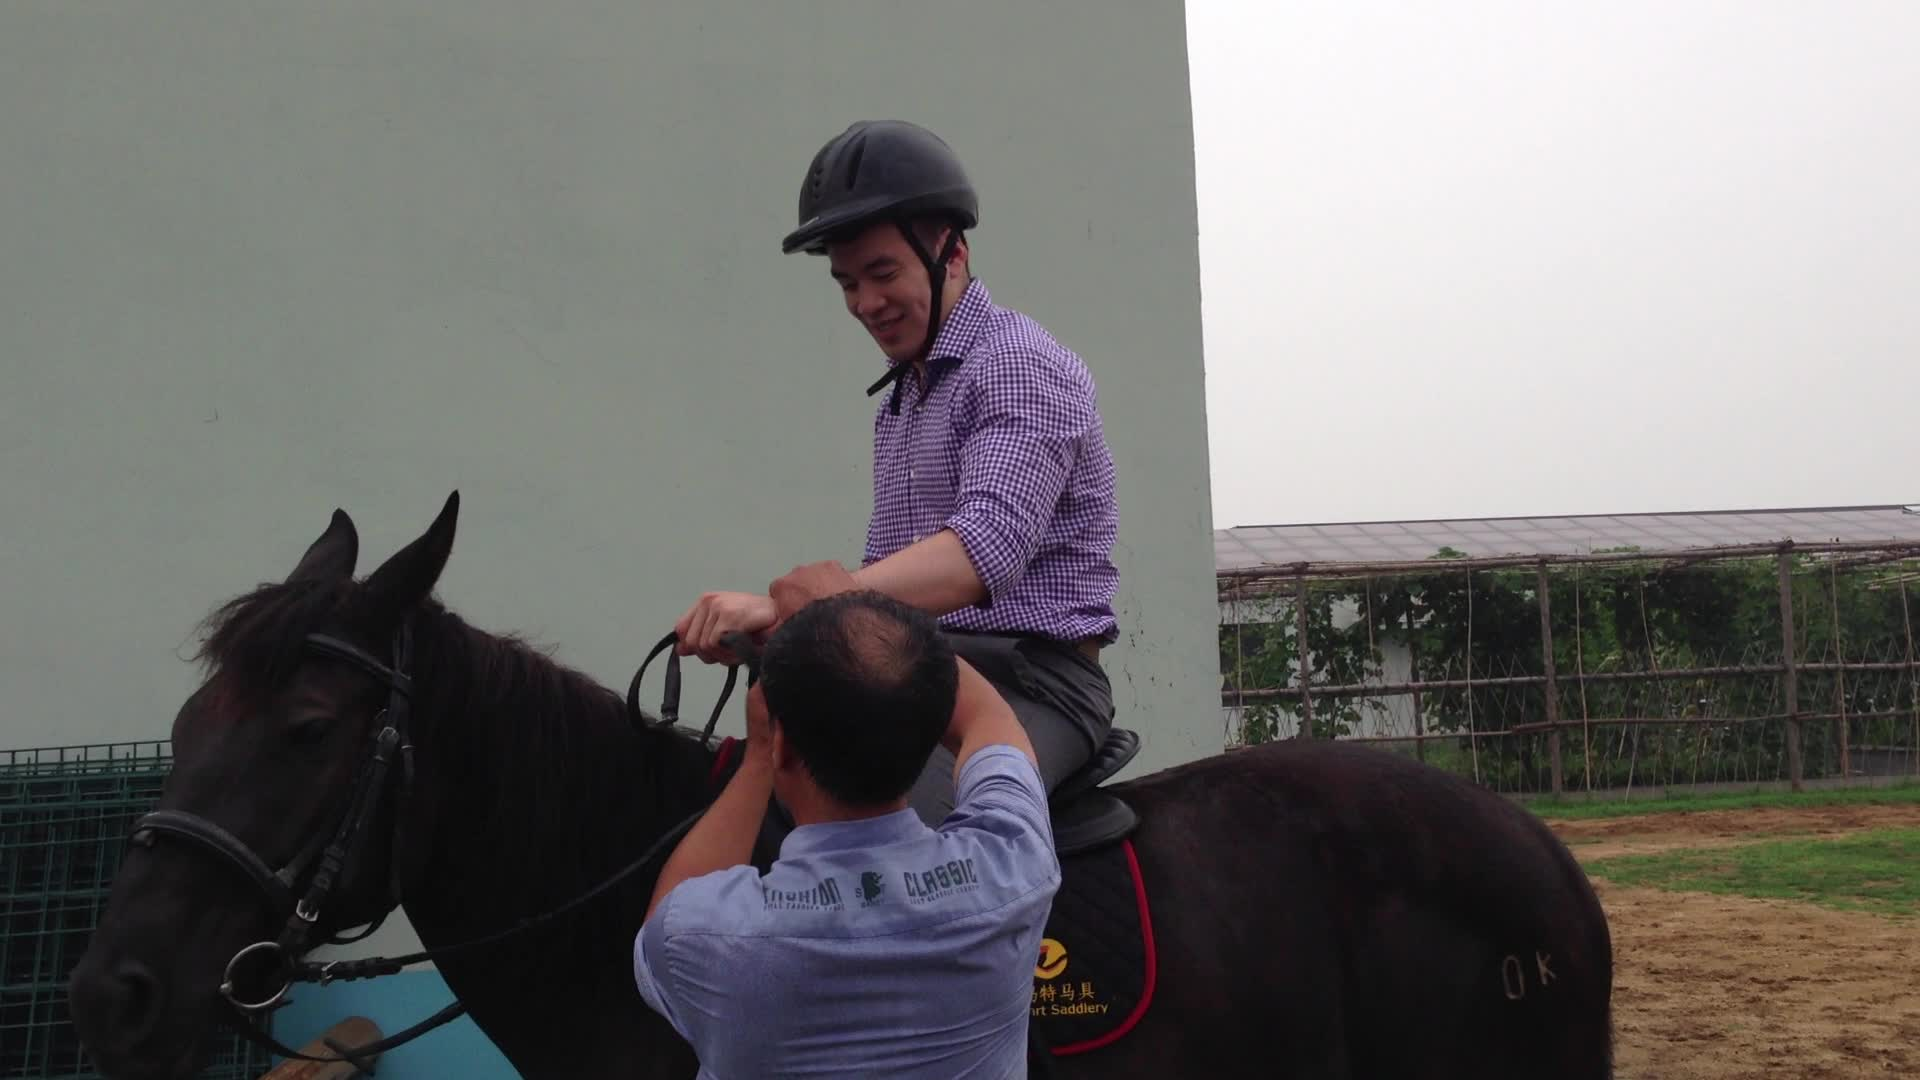 Epic Horse Fail Pictures 30 Hd Wallpaper